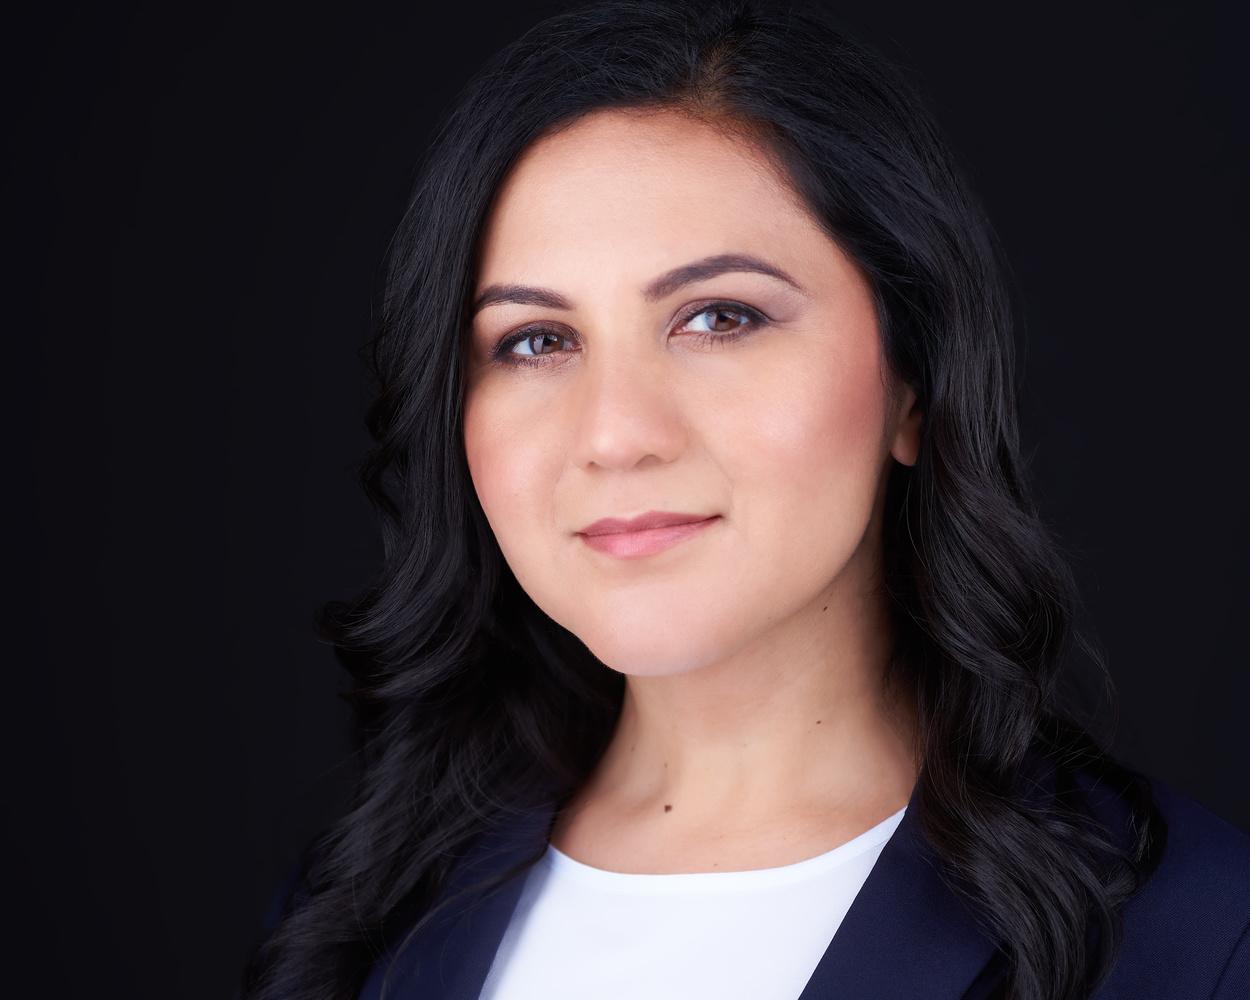 Esmeralda / President of Language Learner Literature Advisory Board (LLLAB) by Egis Jurgaitis